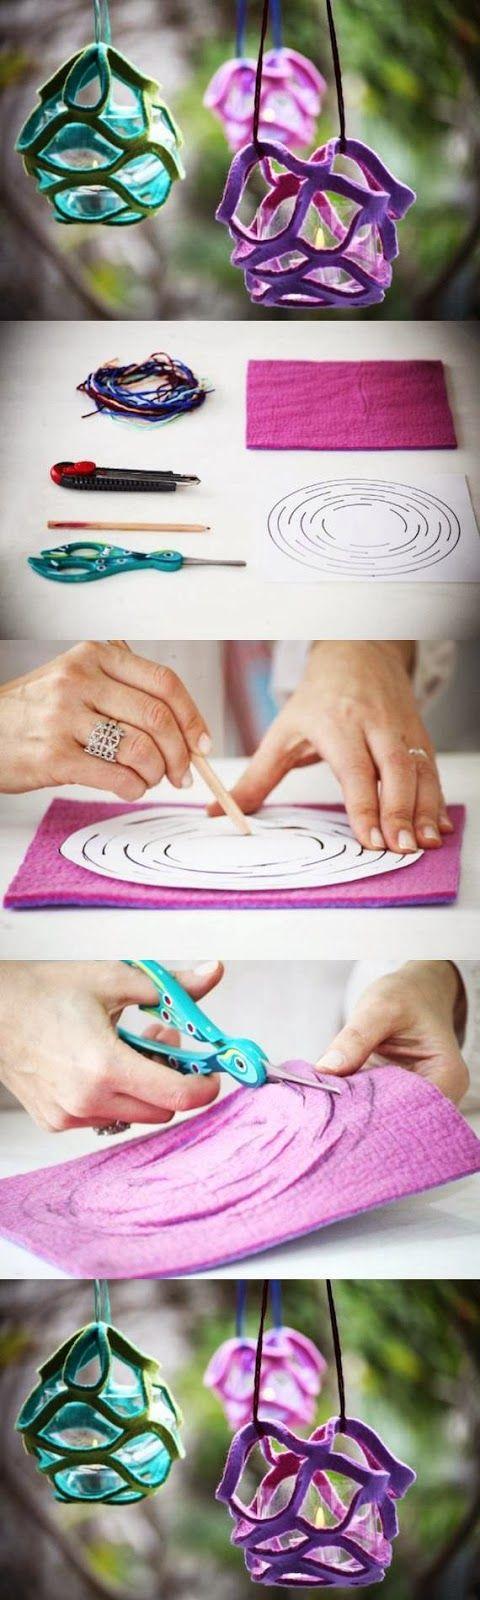 DIY : Felt Candle Holder   DIY & Crafts Tutorials